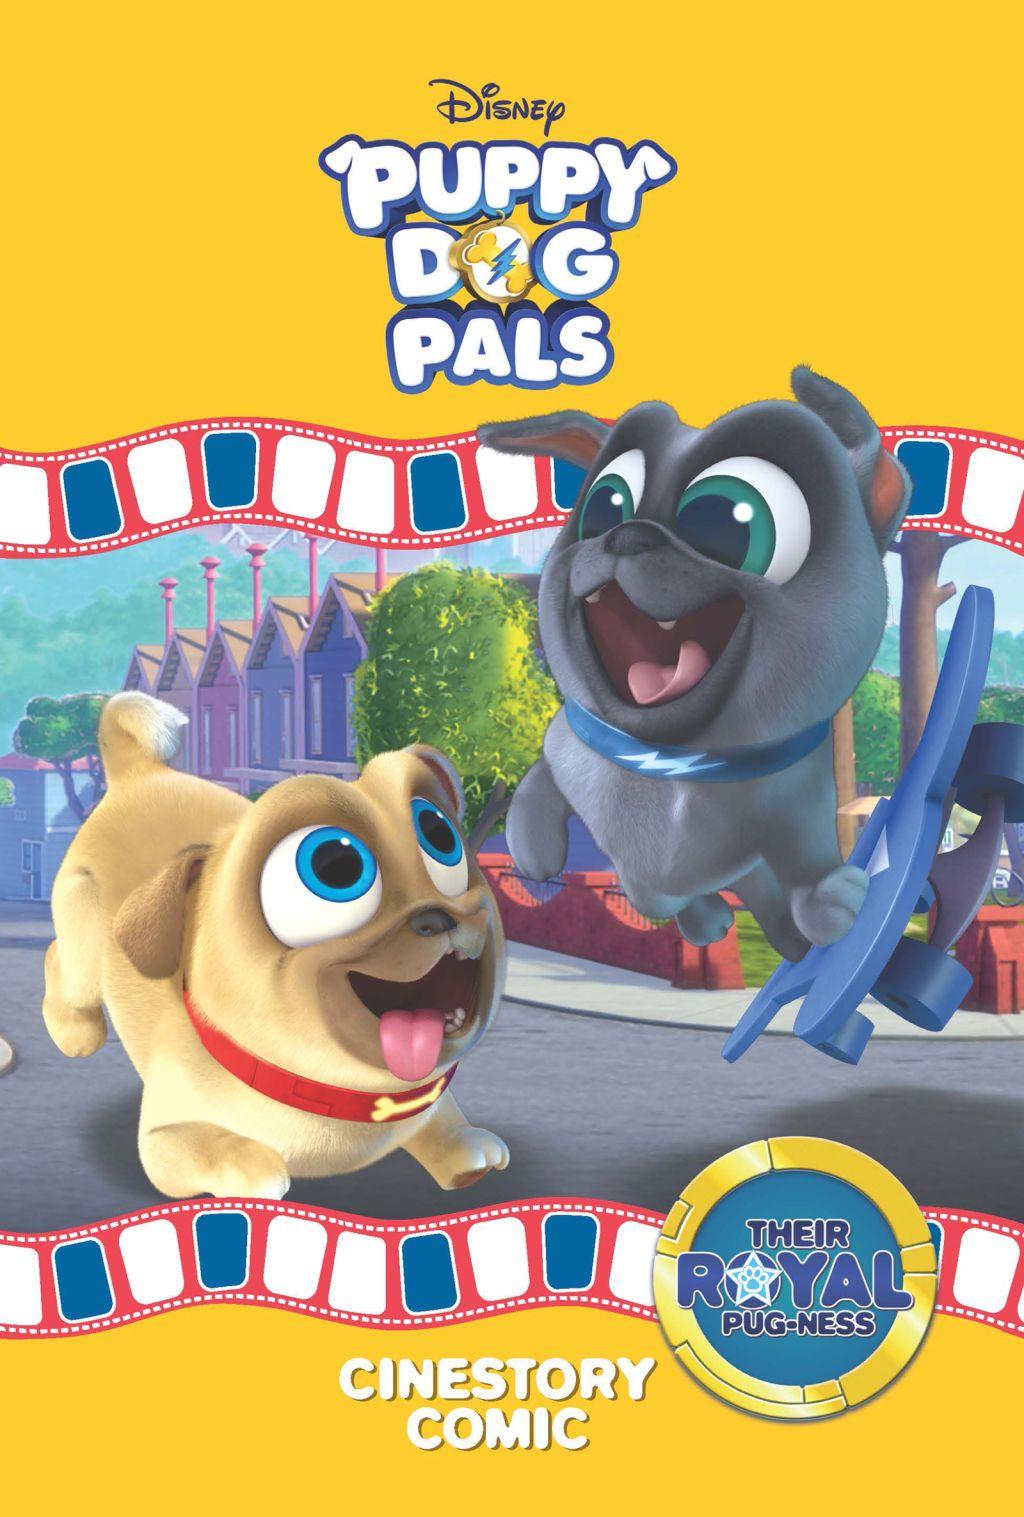 Disney Puppy Dog Pals Their Royal Pugness Cinestory